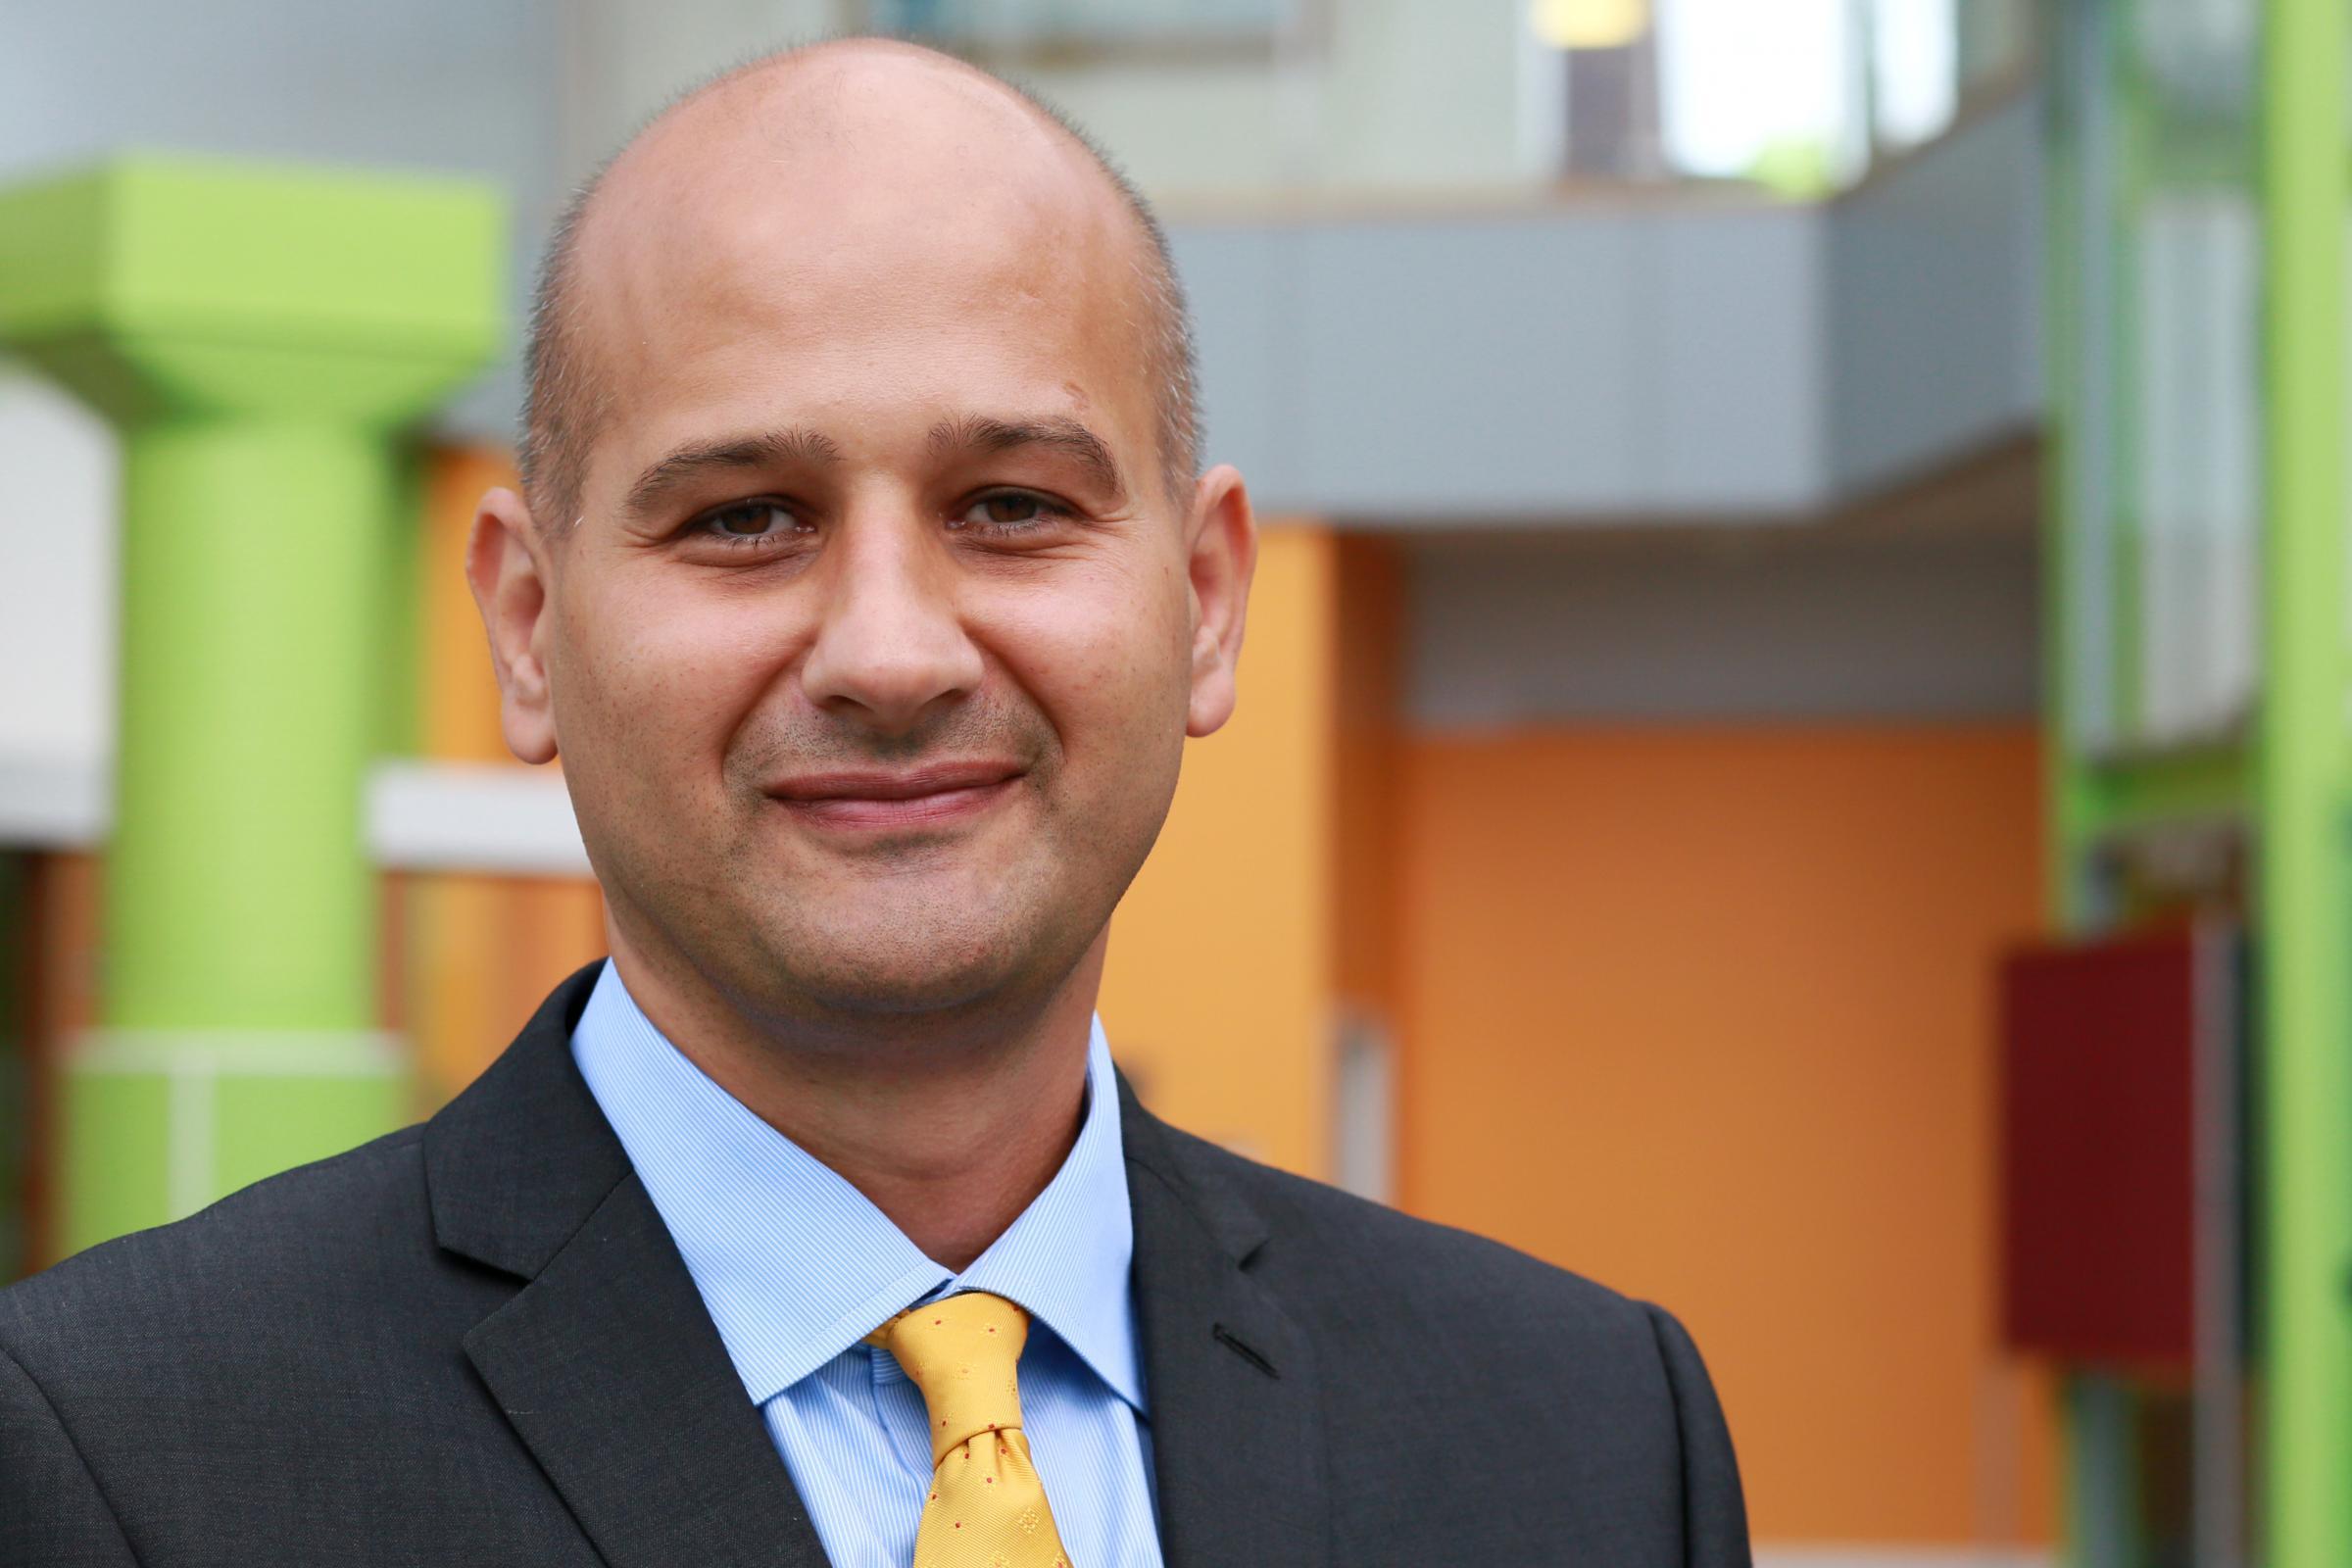 University of Bradford offering £4m in postgrad scholarships